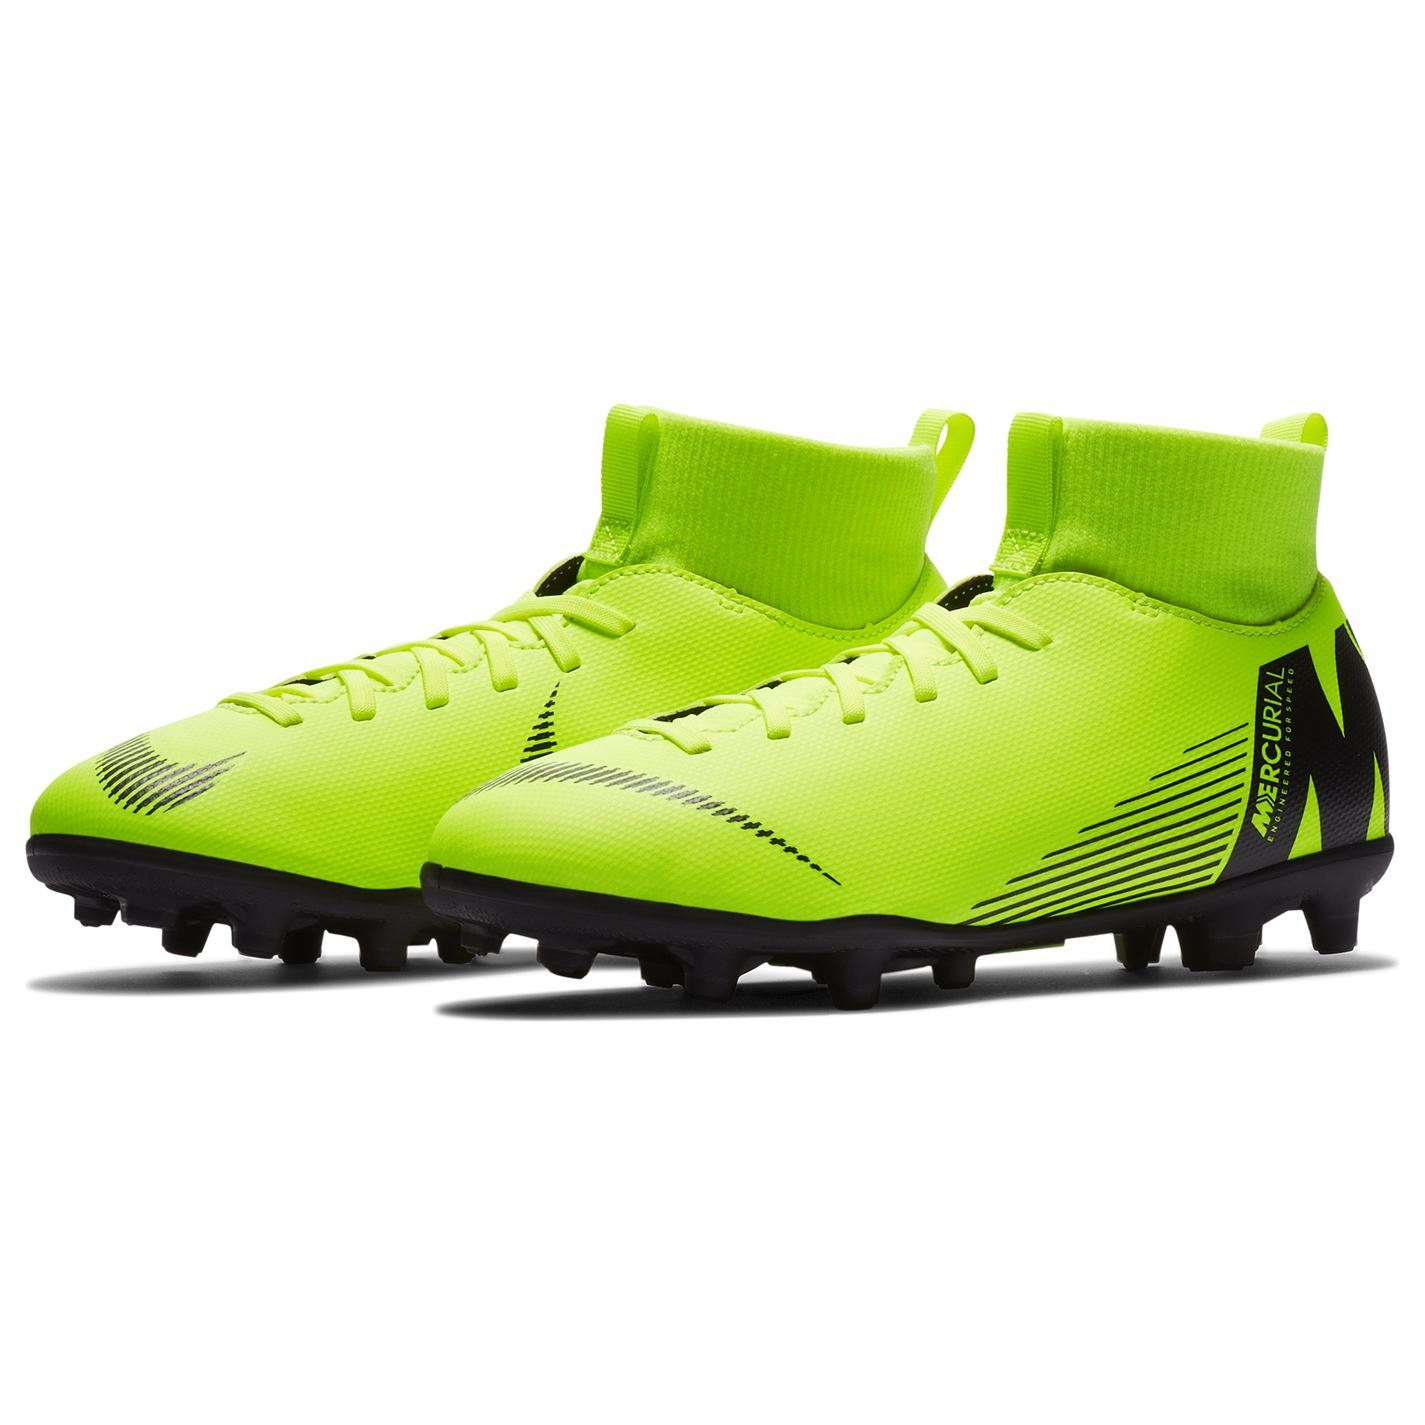 Nike-MERCURIAL-SUPERFLY-Club-DF-TERRA-FERMA-SCARPE-DA-CALCIO-JUNIOR-CALCIO-Cunei miniatura 12